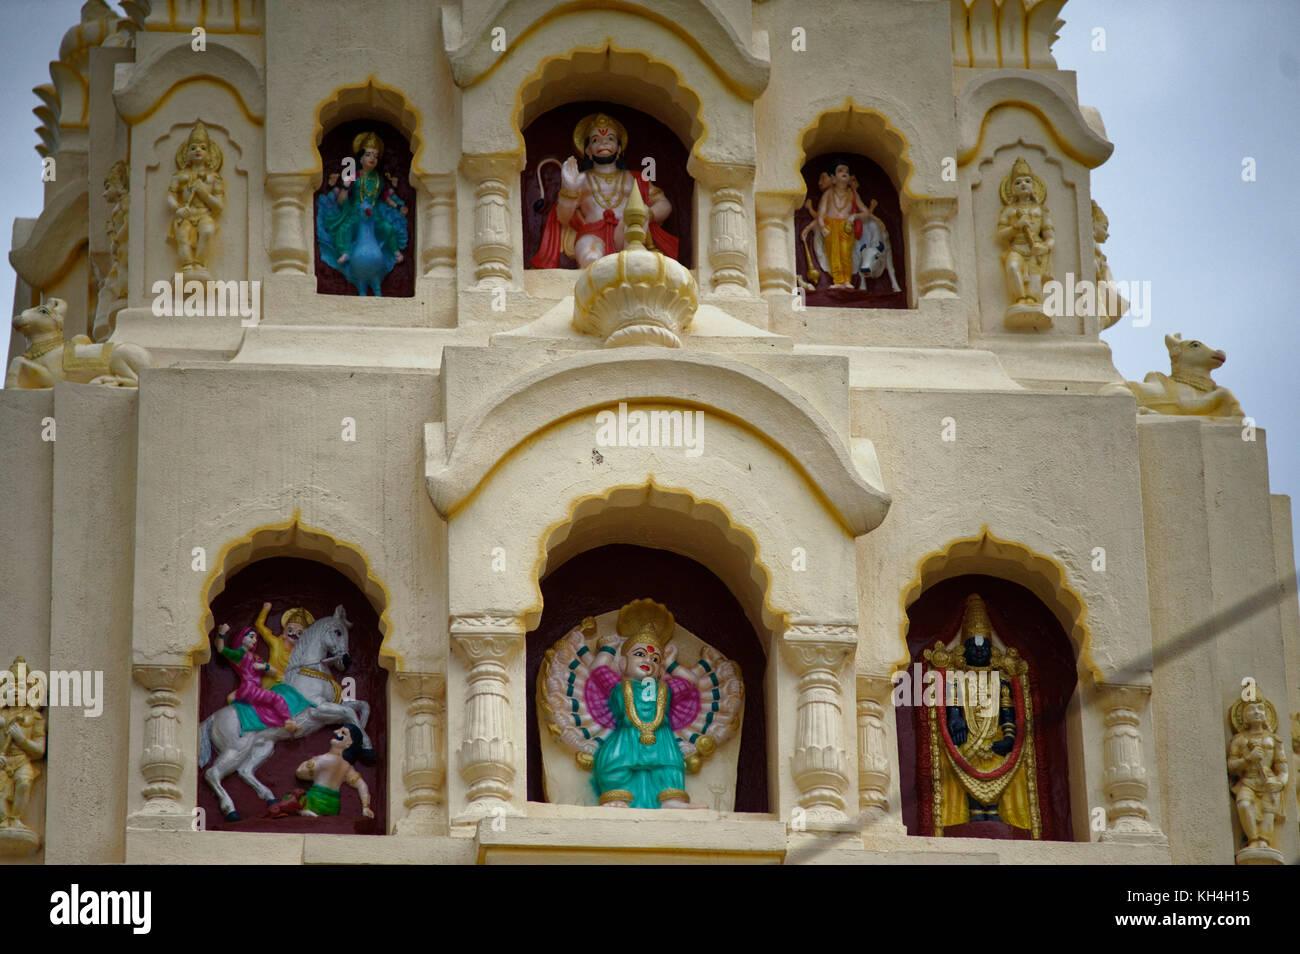 Ambabai Tempel, miraj, Maharashtra, Indien, Asien Stockbild